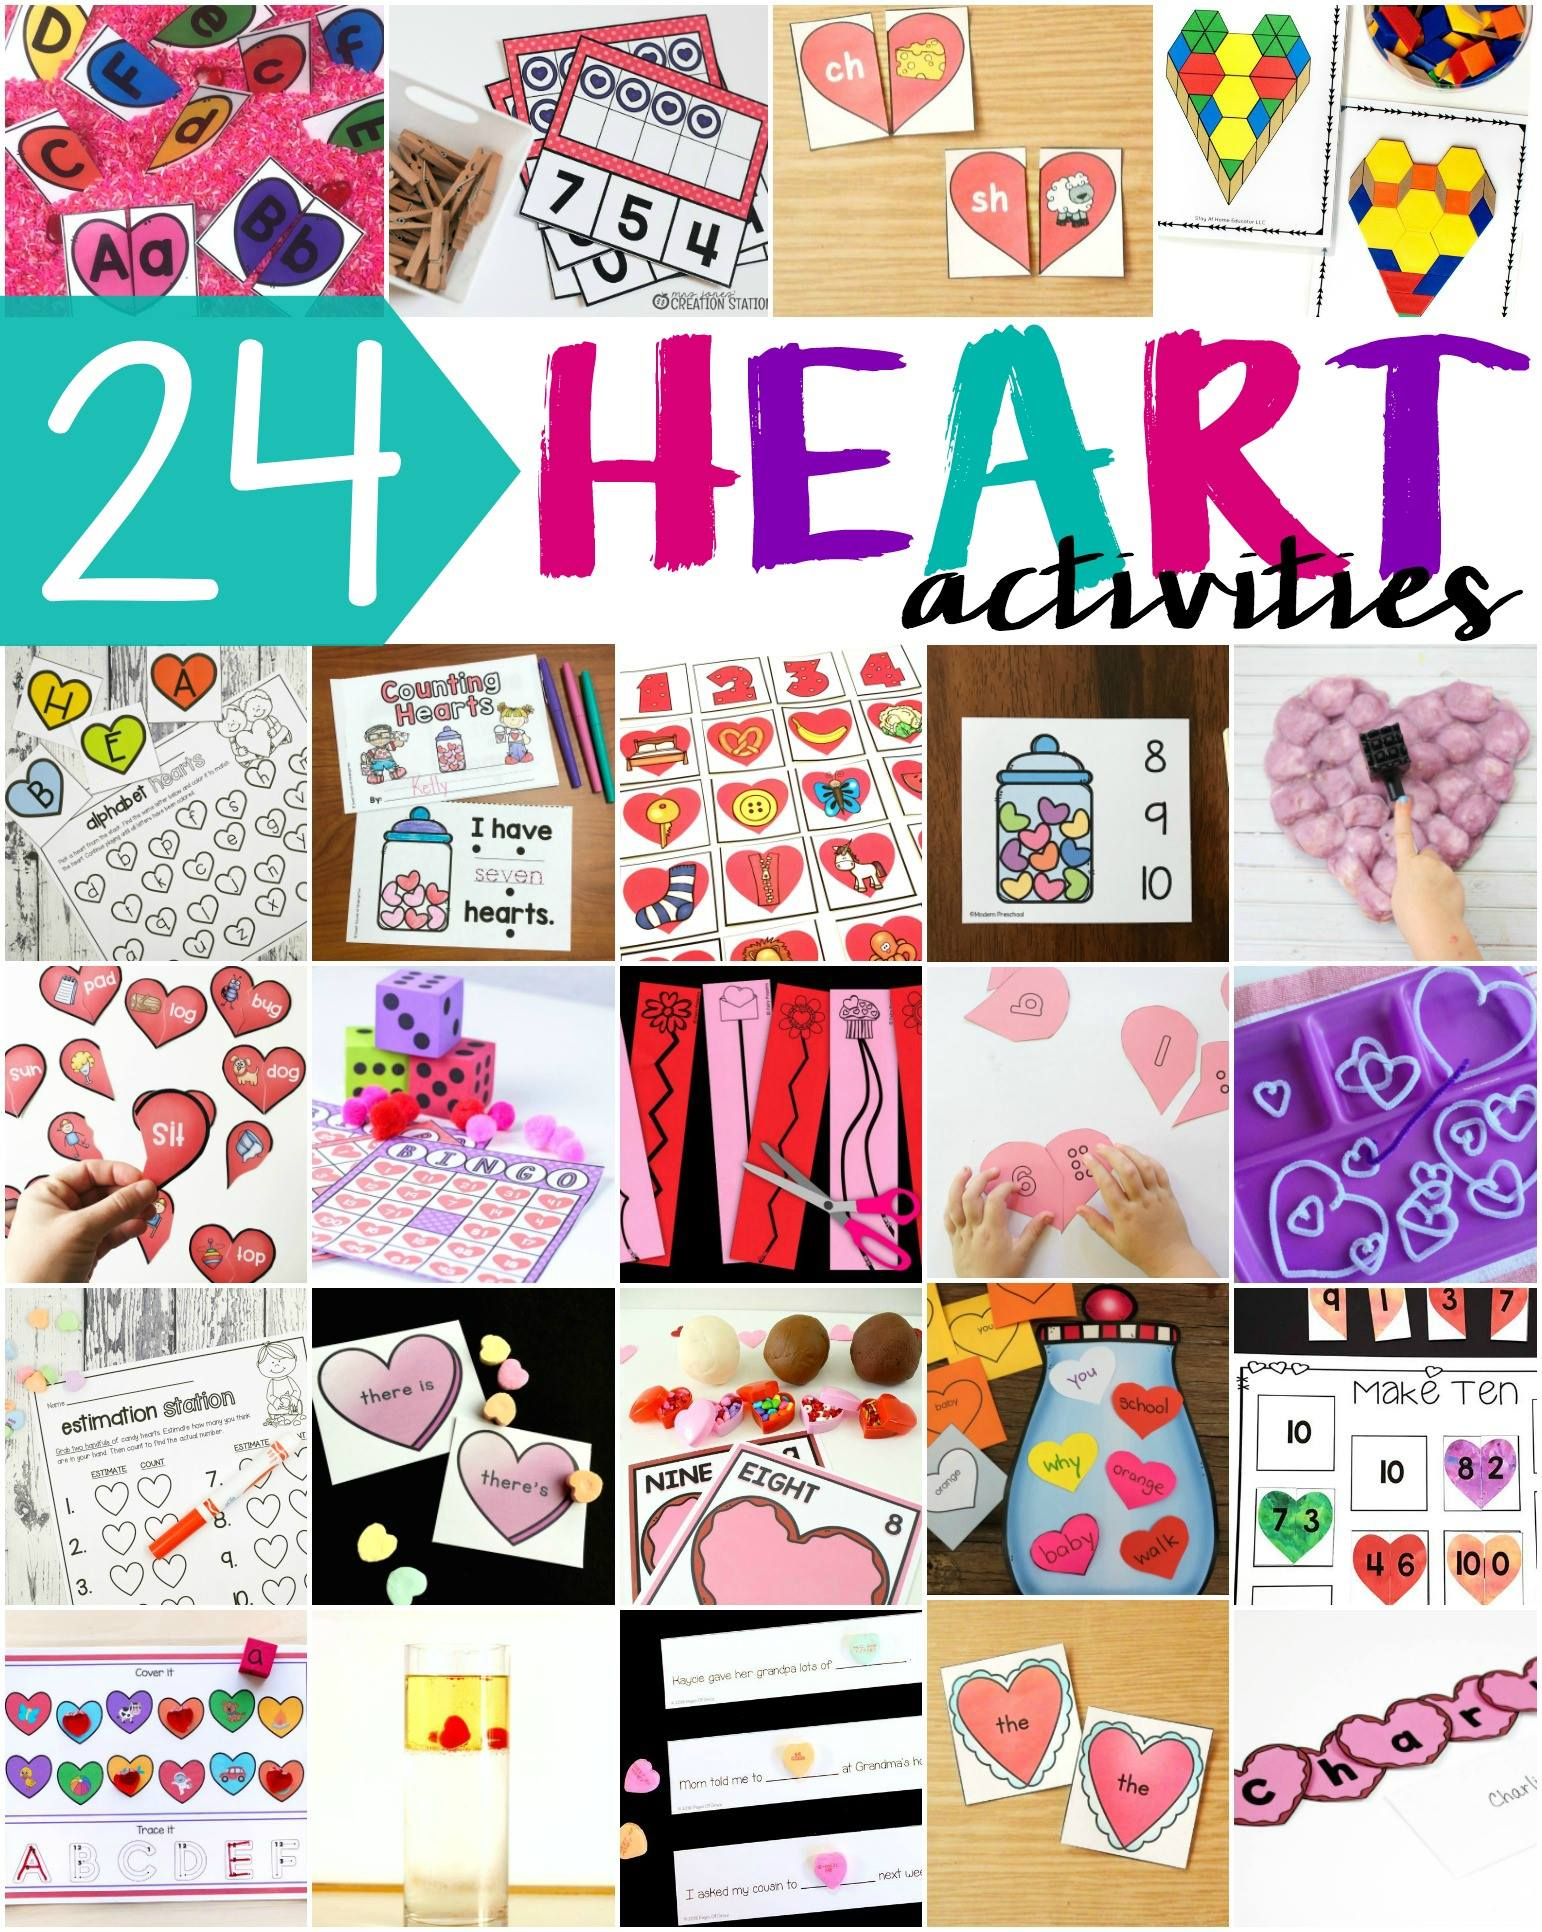 Heart activities for Valentine's Day #valentinesday #heartactivities